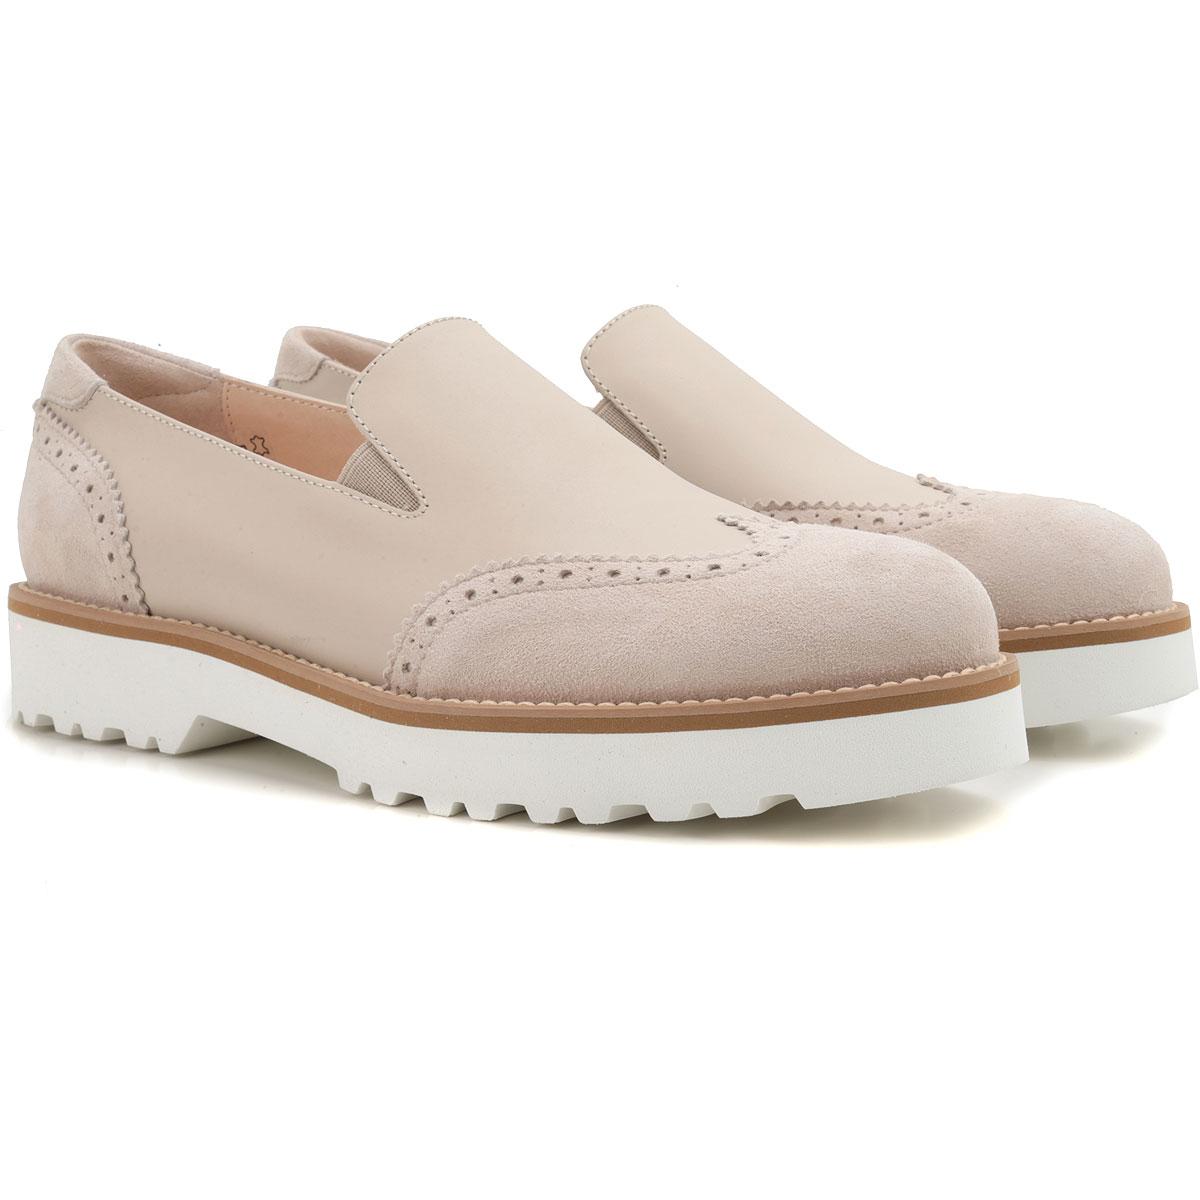 chaussures femme hogan code produit hxw2590r3308esm024. Black Bedroom Furniture Sets. Home Design Ideas